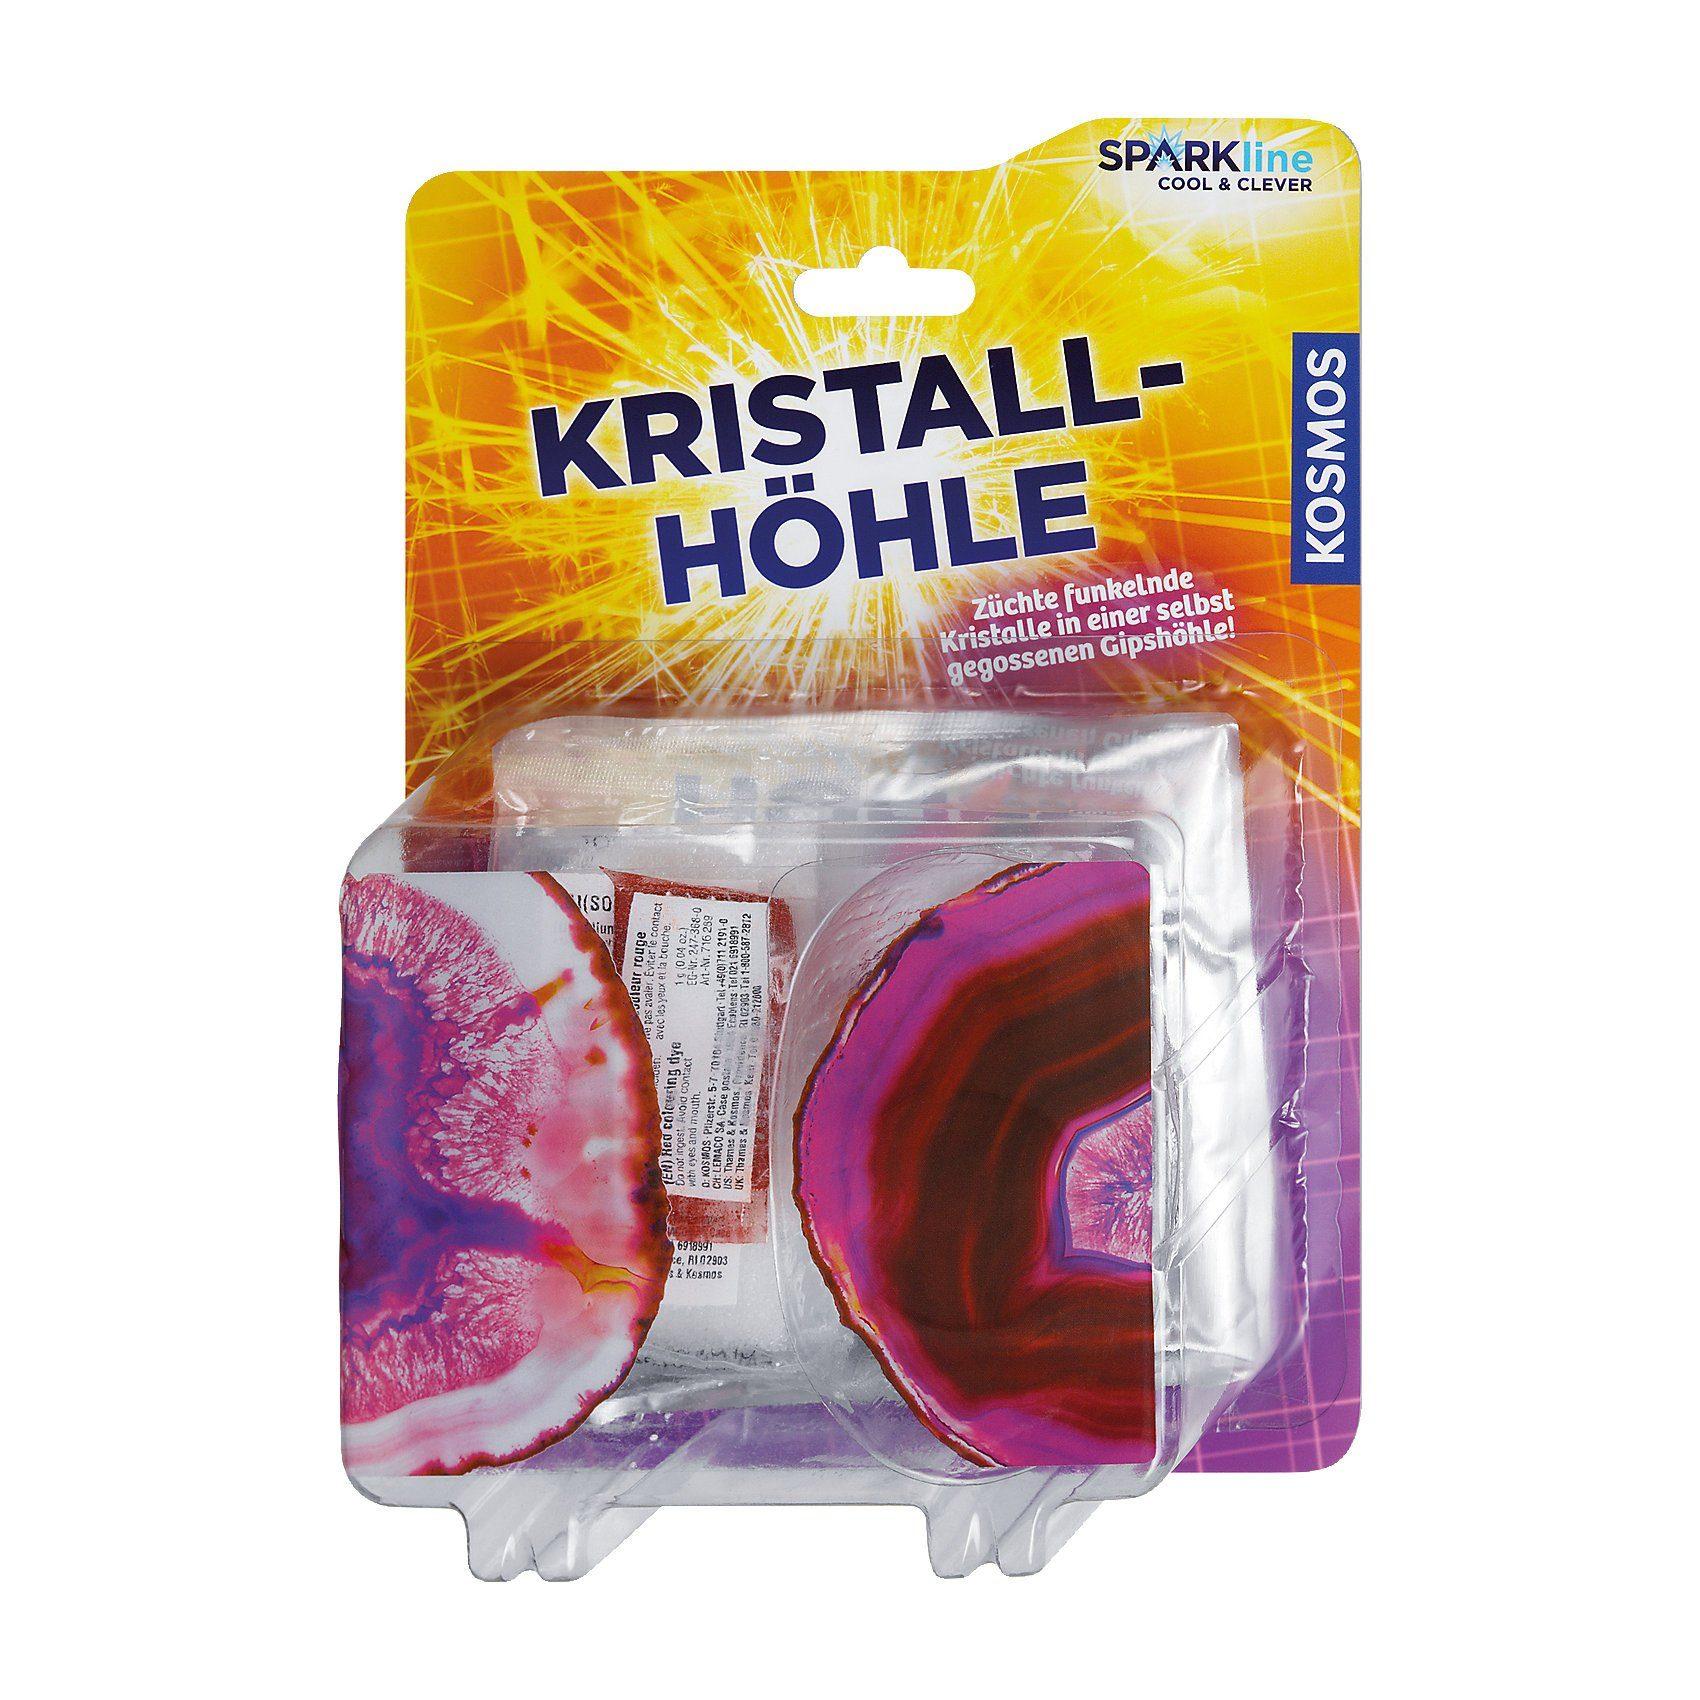 Kosmos SPARKline Kristallhöhle